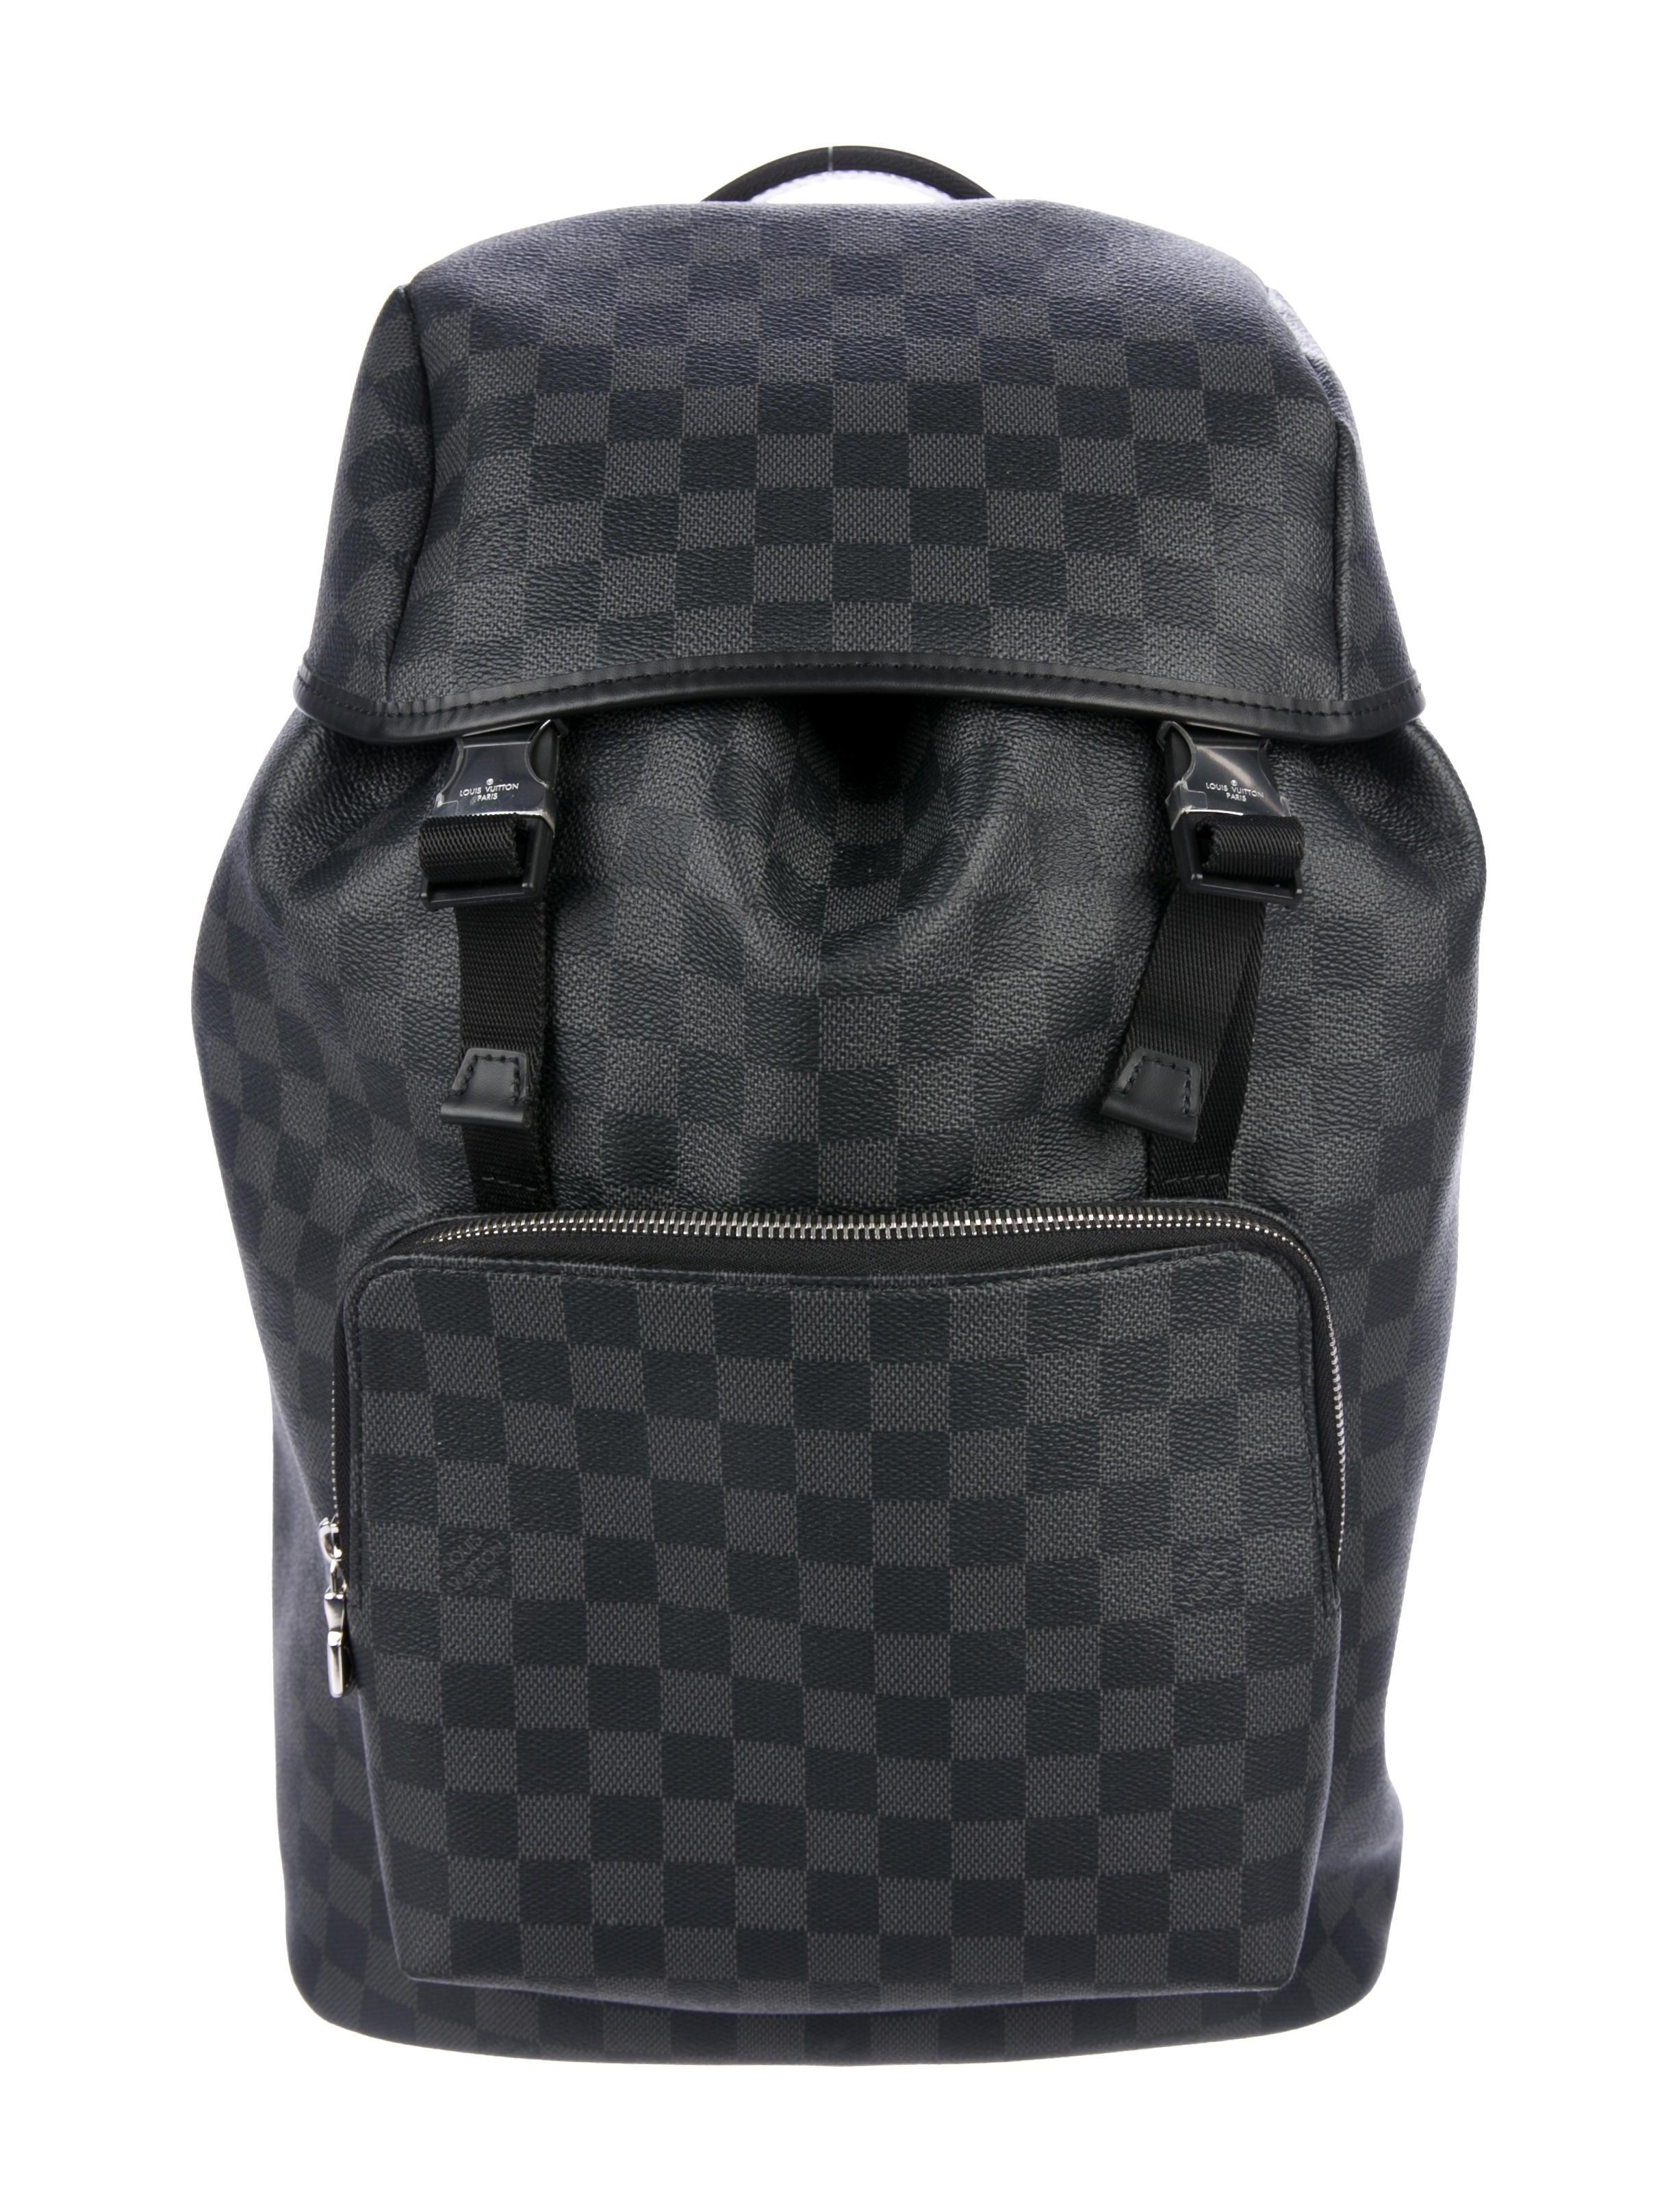 Louis Vuitton 2018 Damier Graphite Zack Backpack - Bags - LOU181653 ... 74bca93bdb